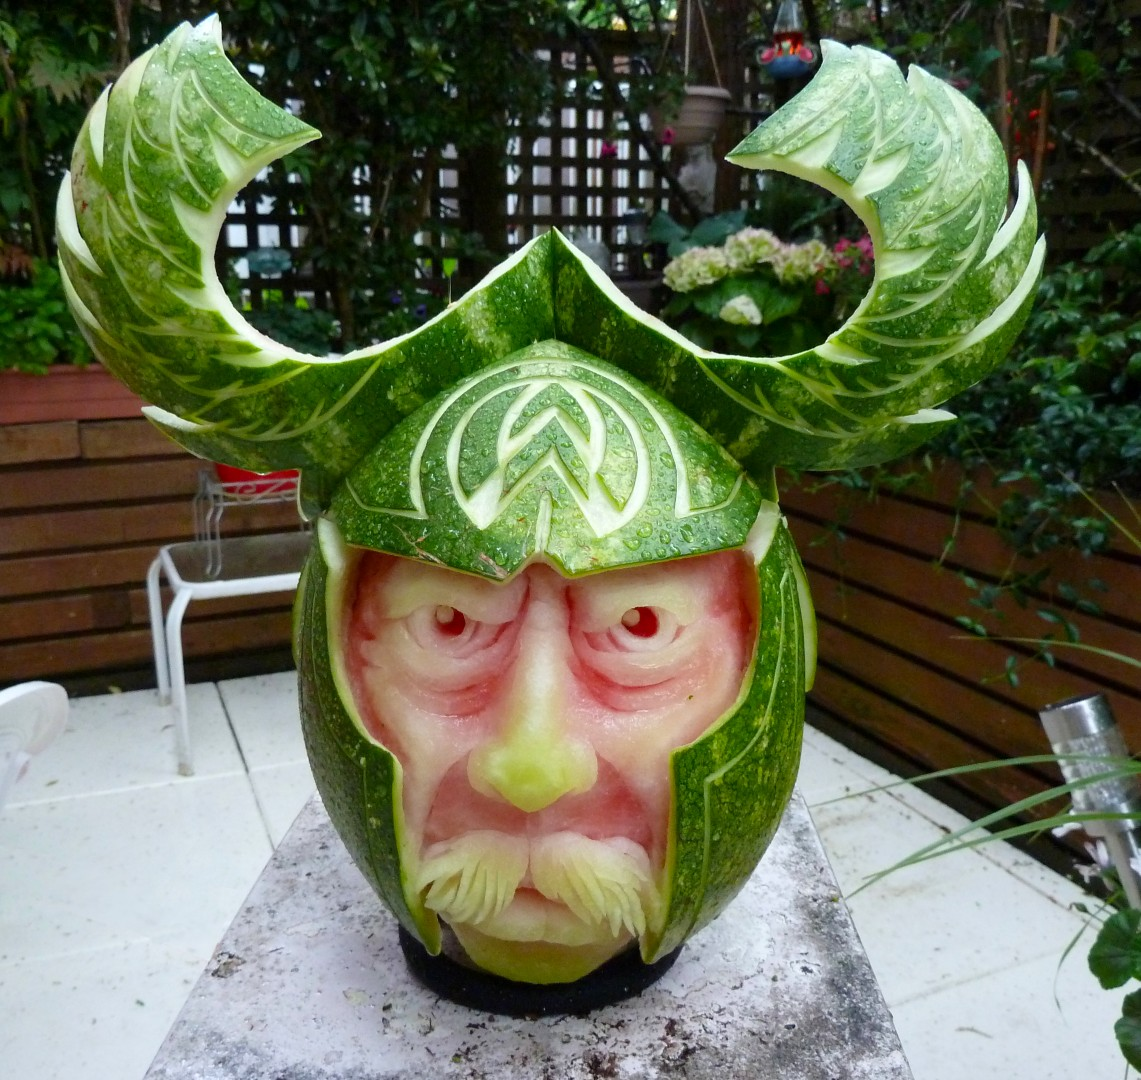 ===El arte comestible=== Viking-watermelon-carving